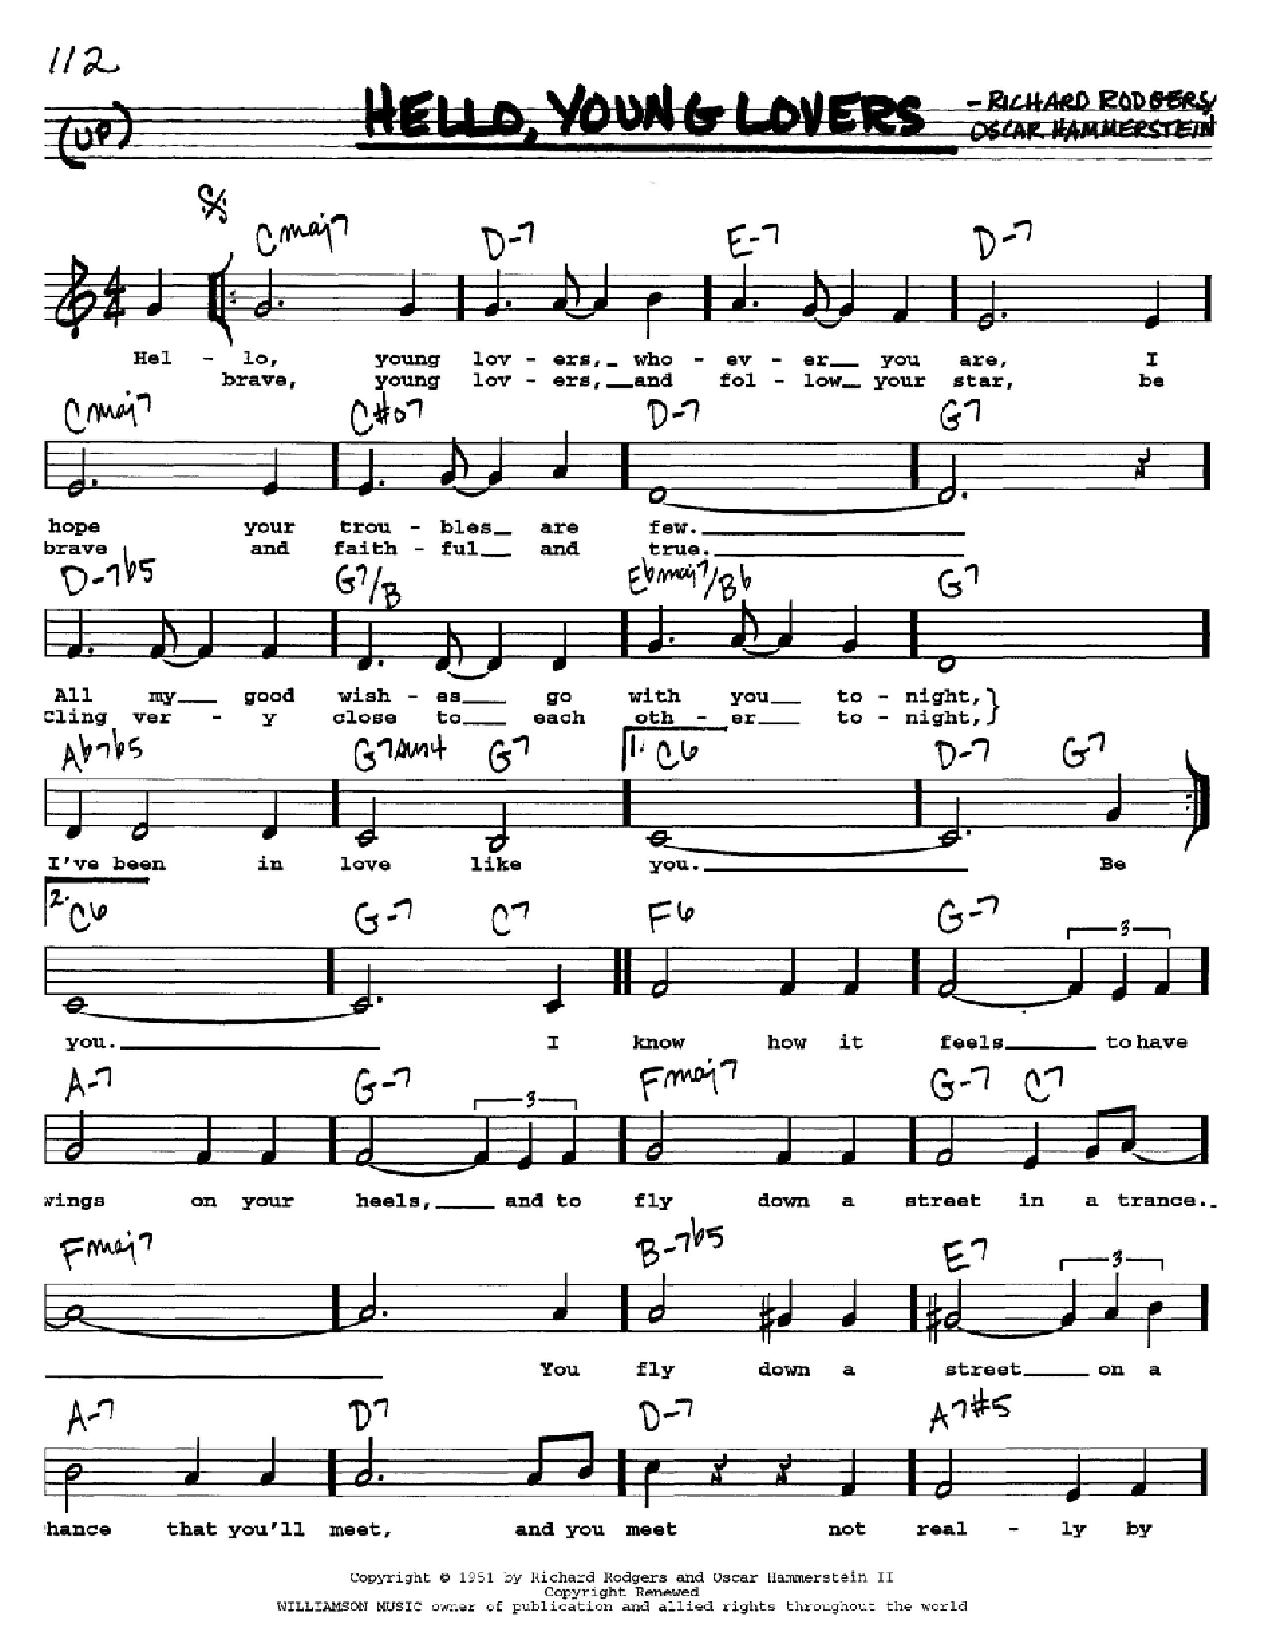 Partition autre Hello, Young Lovers de Rodgers & Hammerstein - Real Book, Melodie, Paroles et Accords, Inst. En Do